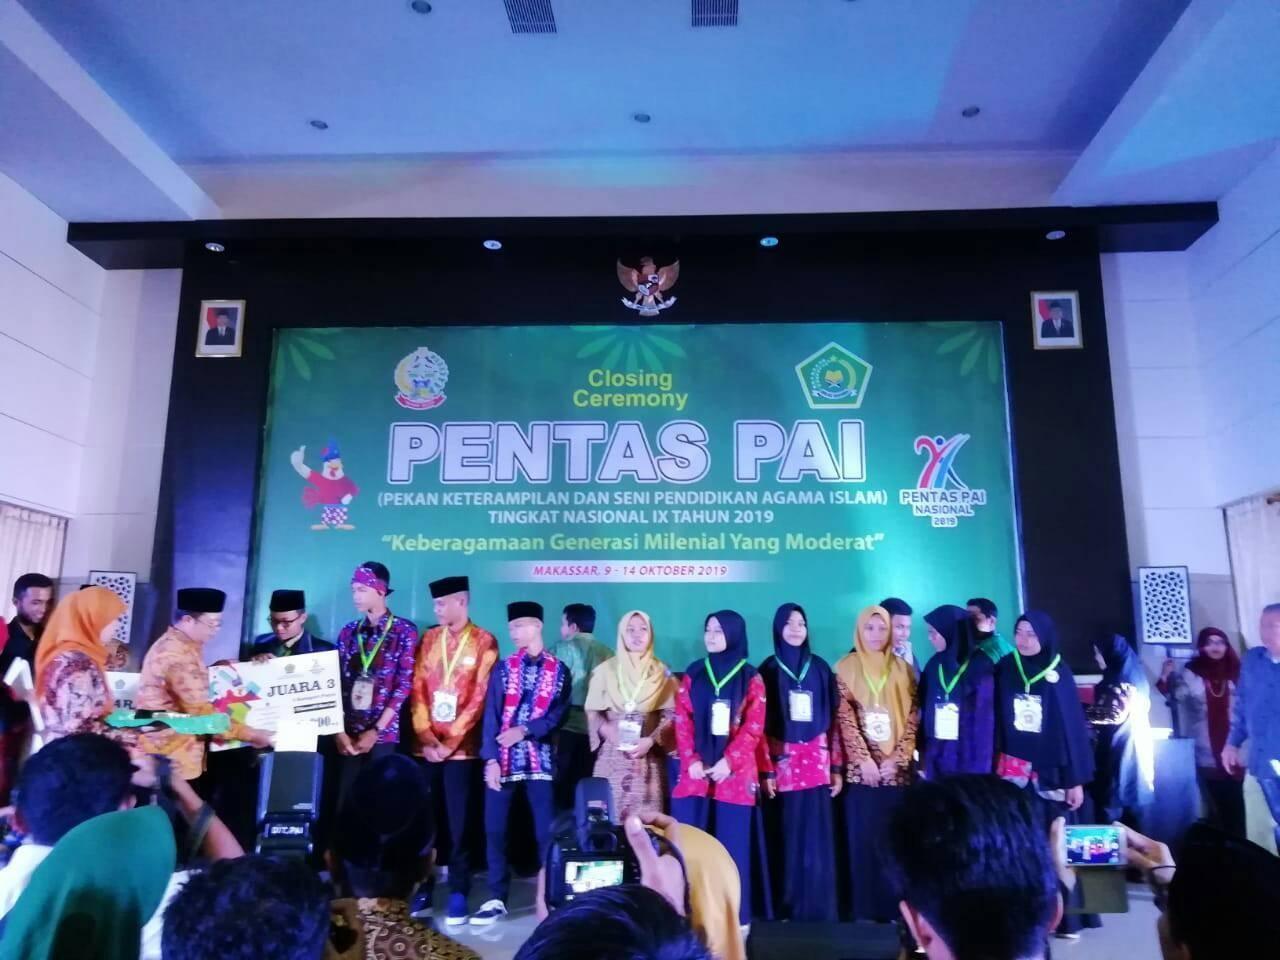 Jawa Barat Raih 13 Medali, Juara Umum Pentas PAI Nasional ke-9